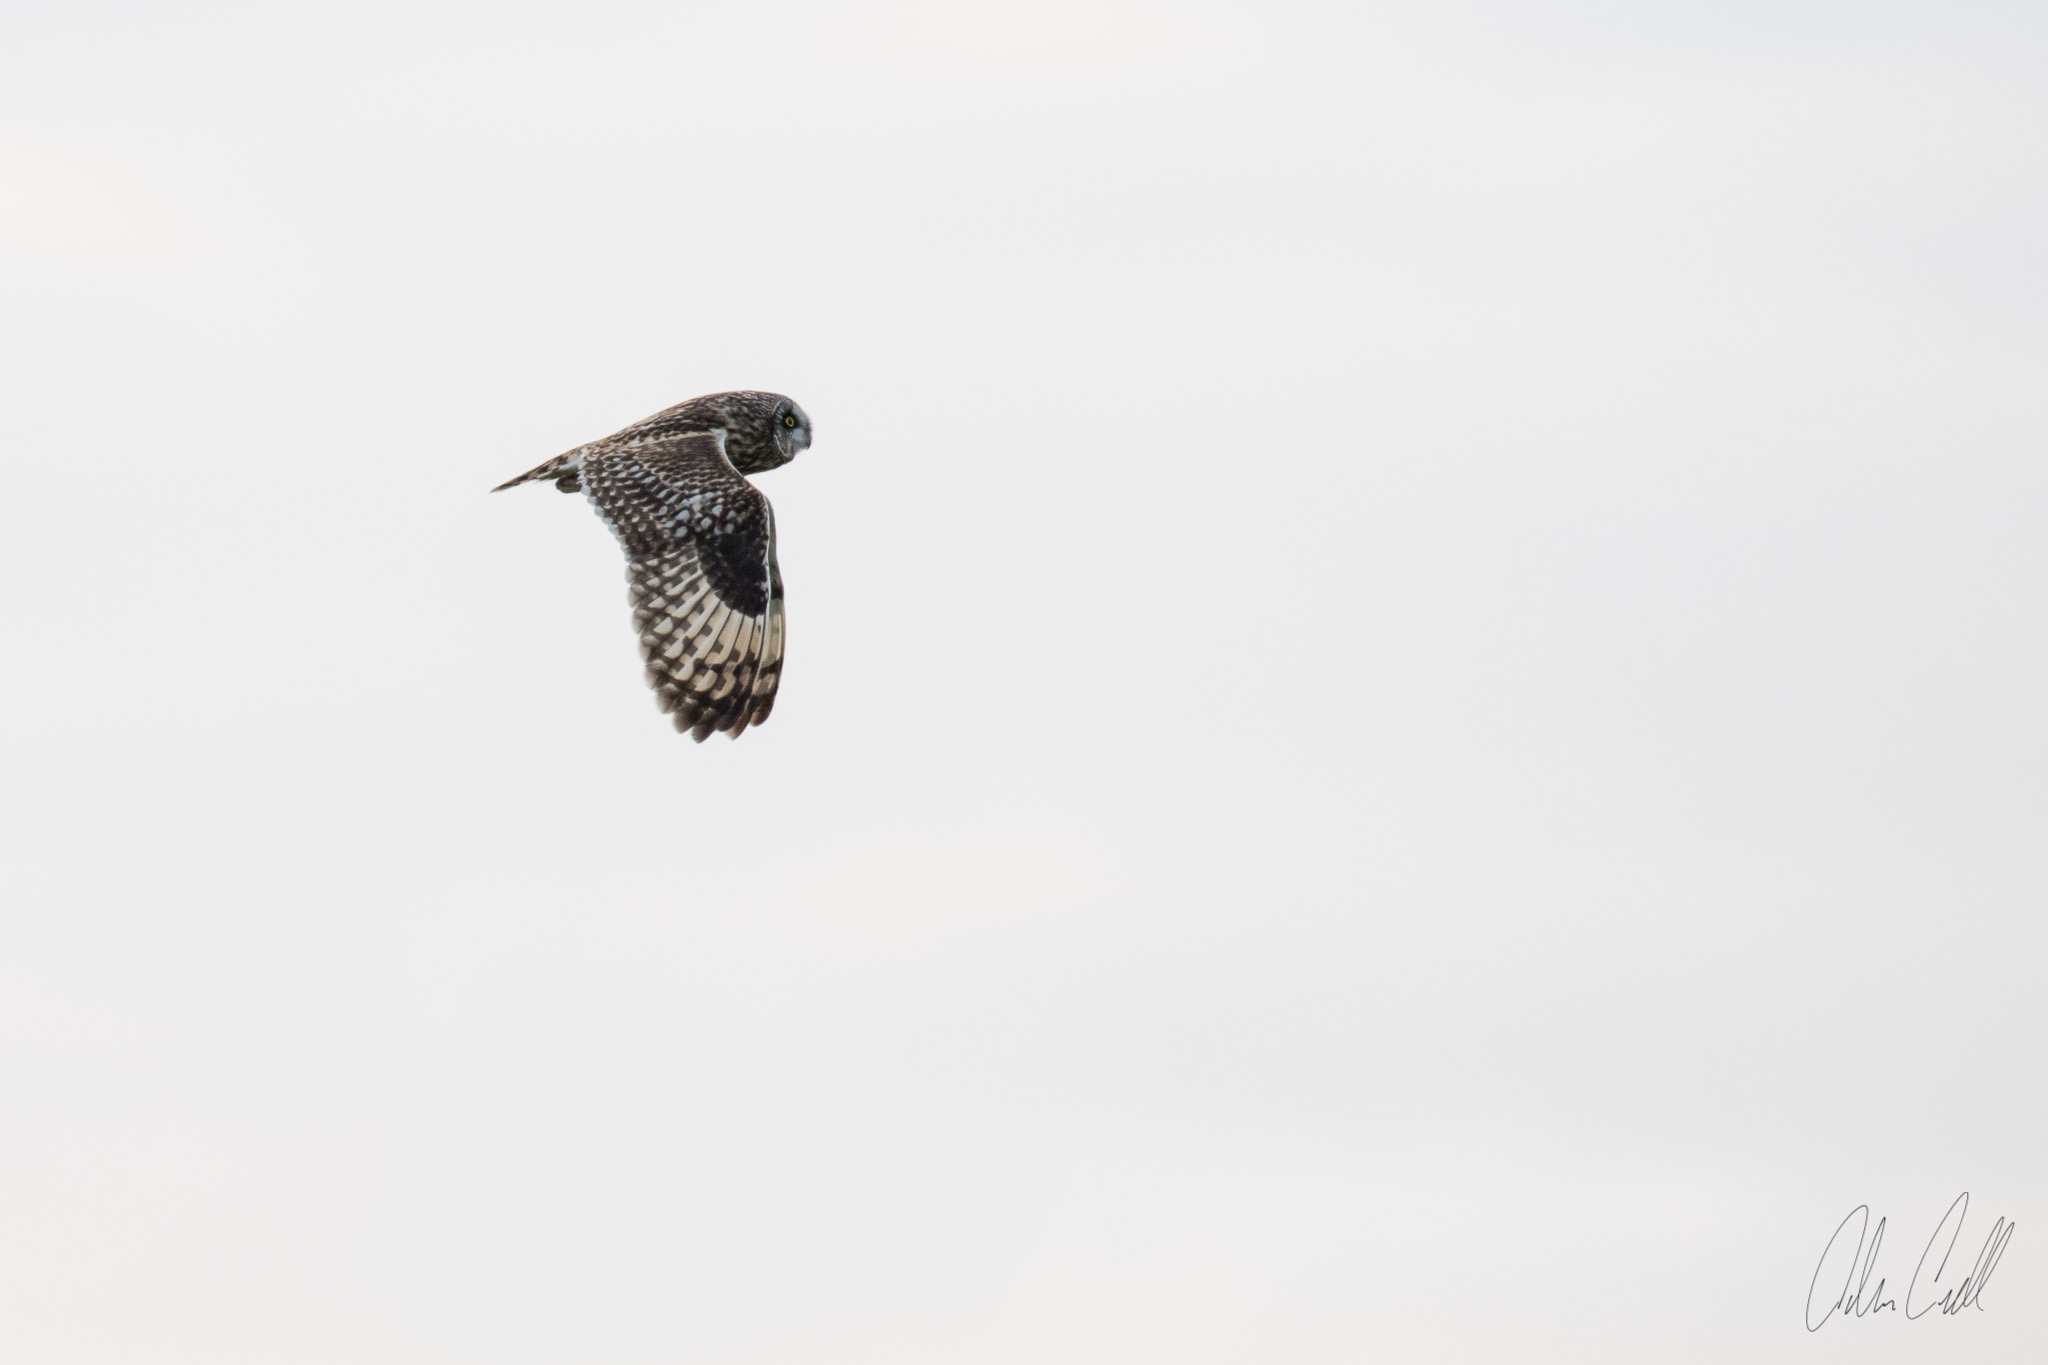 Short-eared Owl Ridgefield Wildlife Refuge #20150402_0080